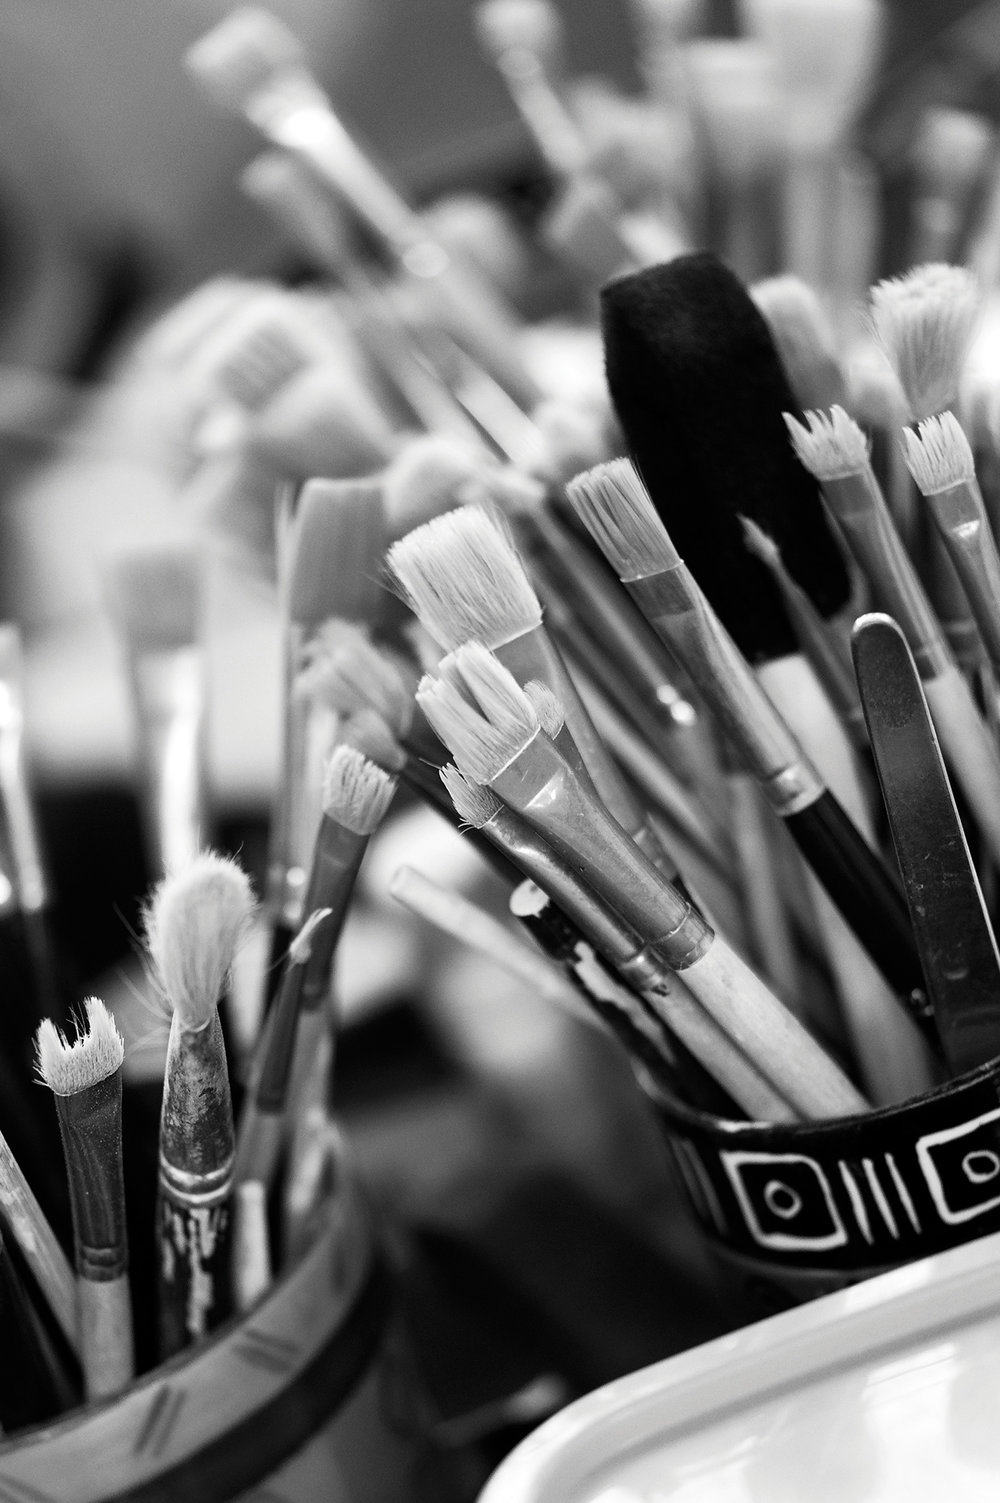 kapula-hand-painted-ceramics-brushes.jpg